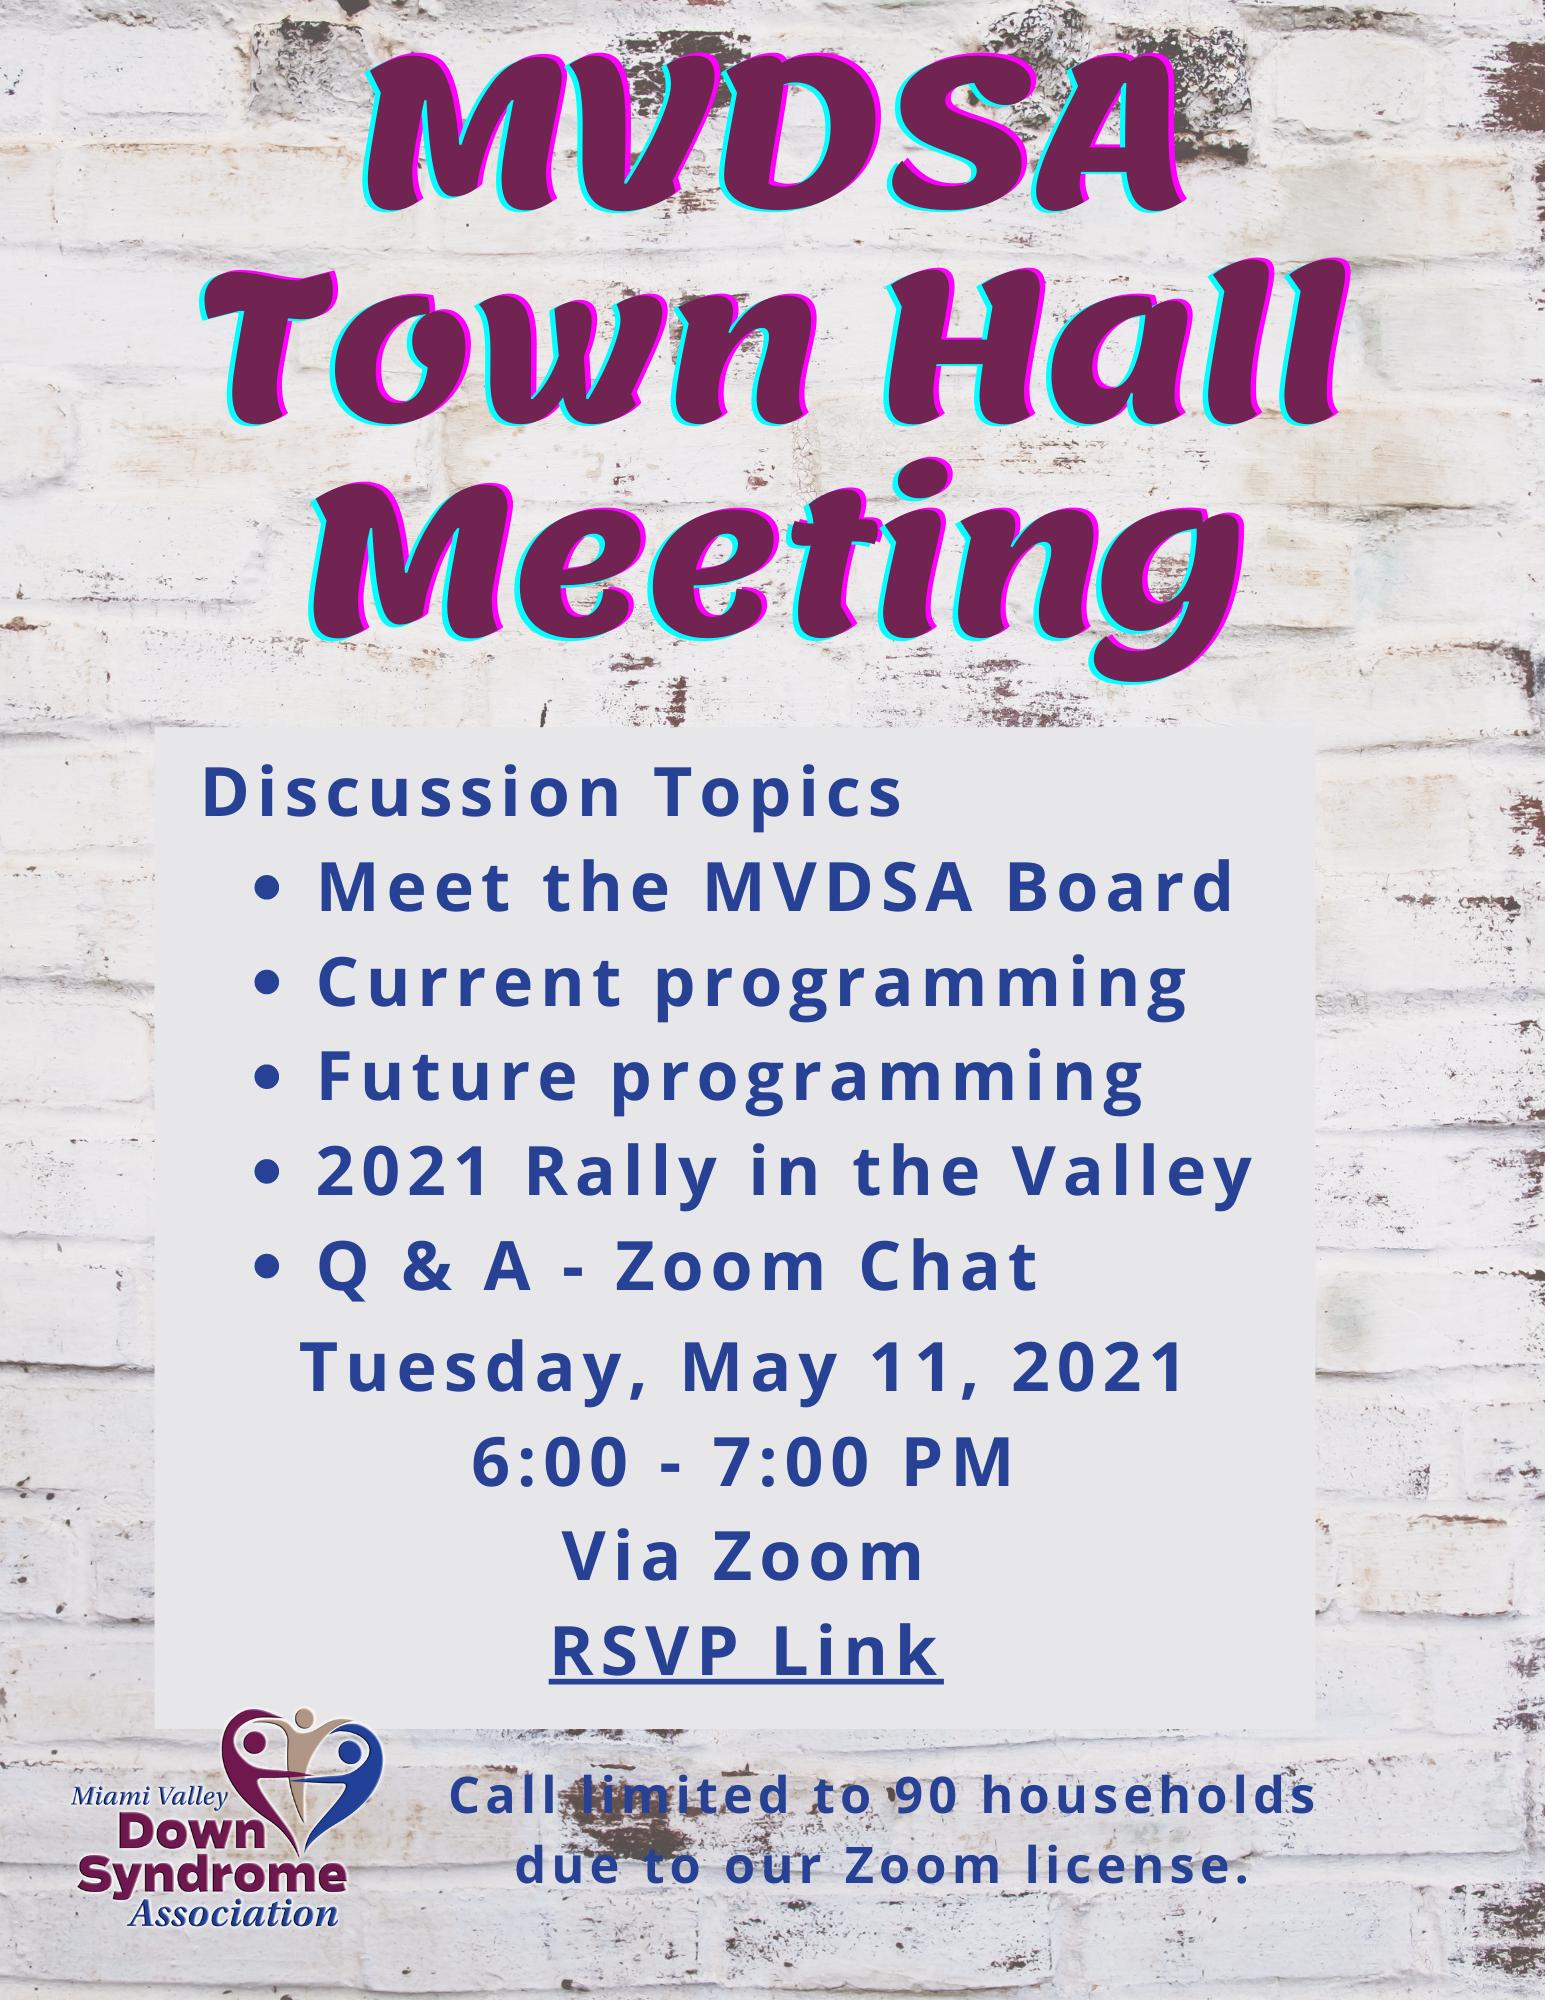 MVDSA Town Hall Meeting